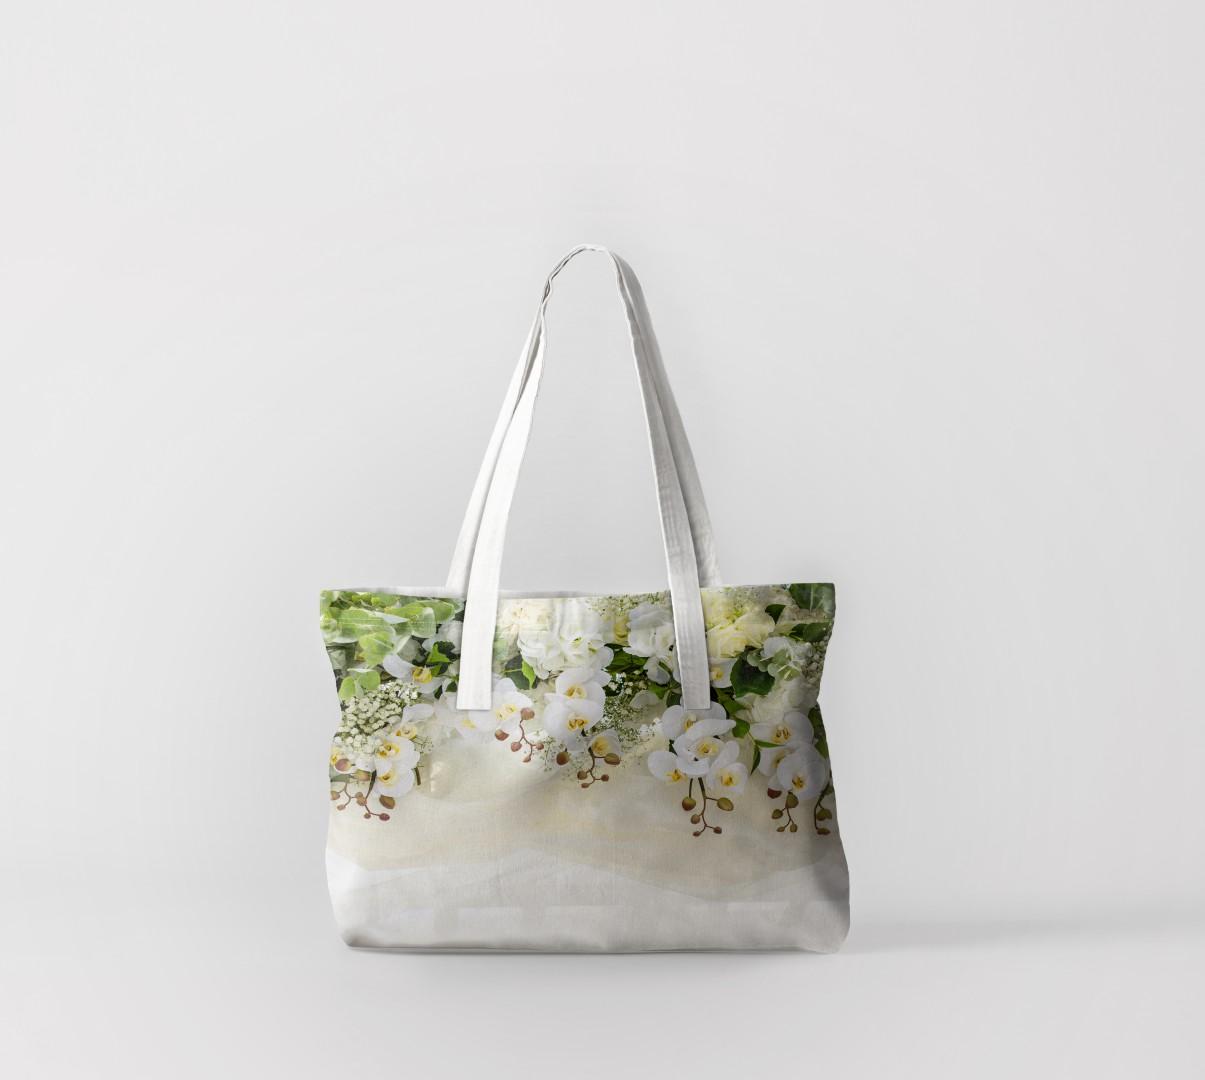 Пляжная сумка Верх из орхидей (50х40 см) Олимп Текстиль oli732560